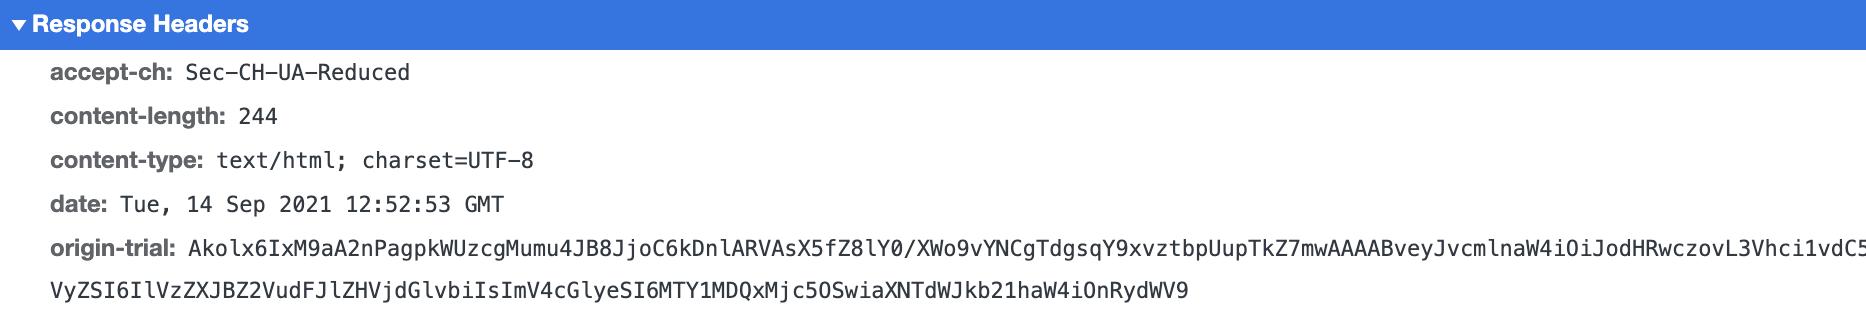 Initial response's headers containing the origin-trial token.